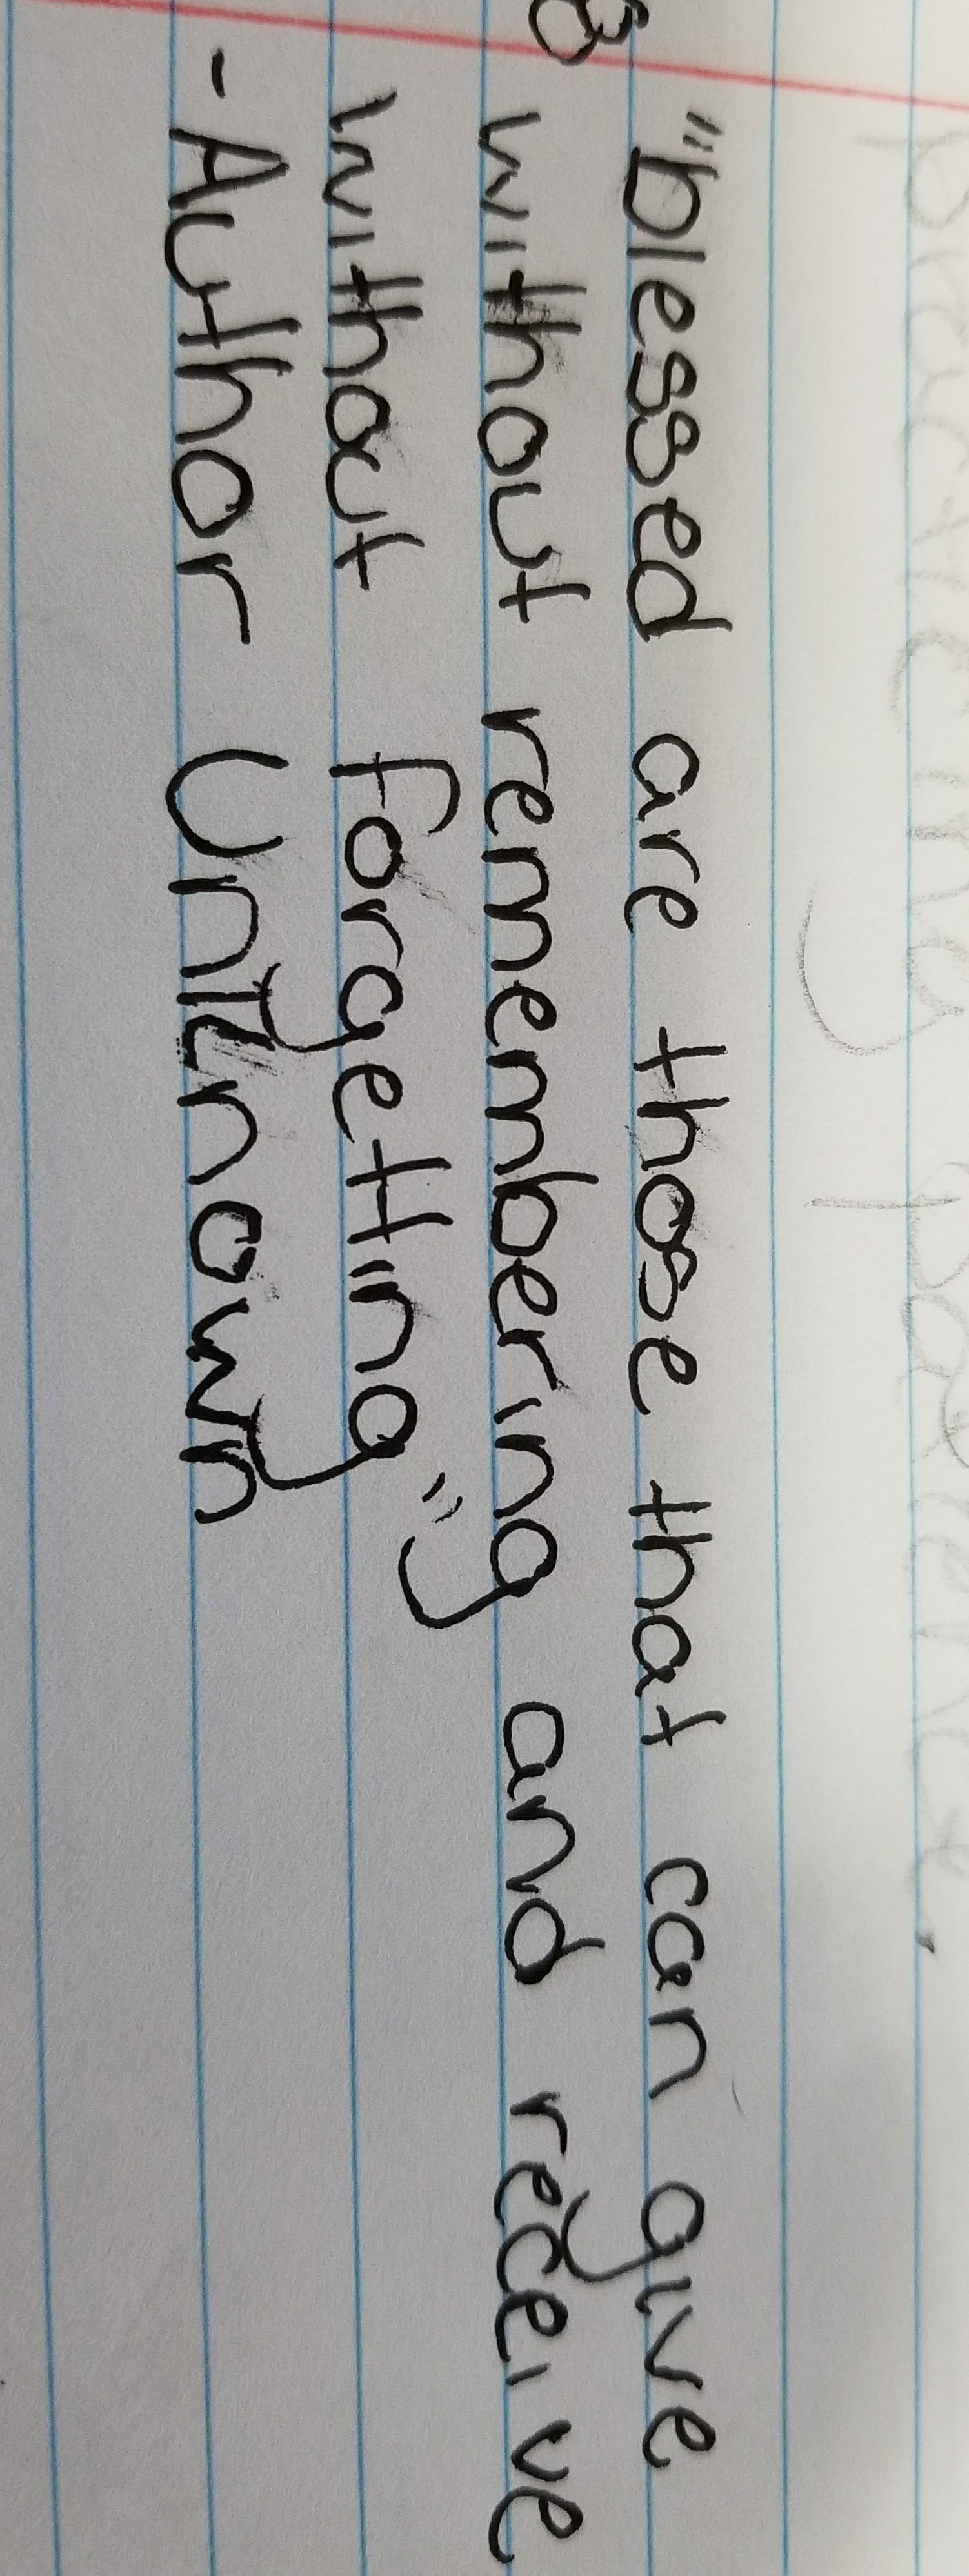 What Does This Quote Mean What Does This Quote Mean  Brainly